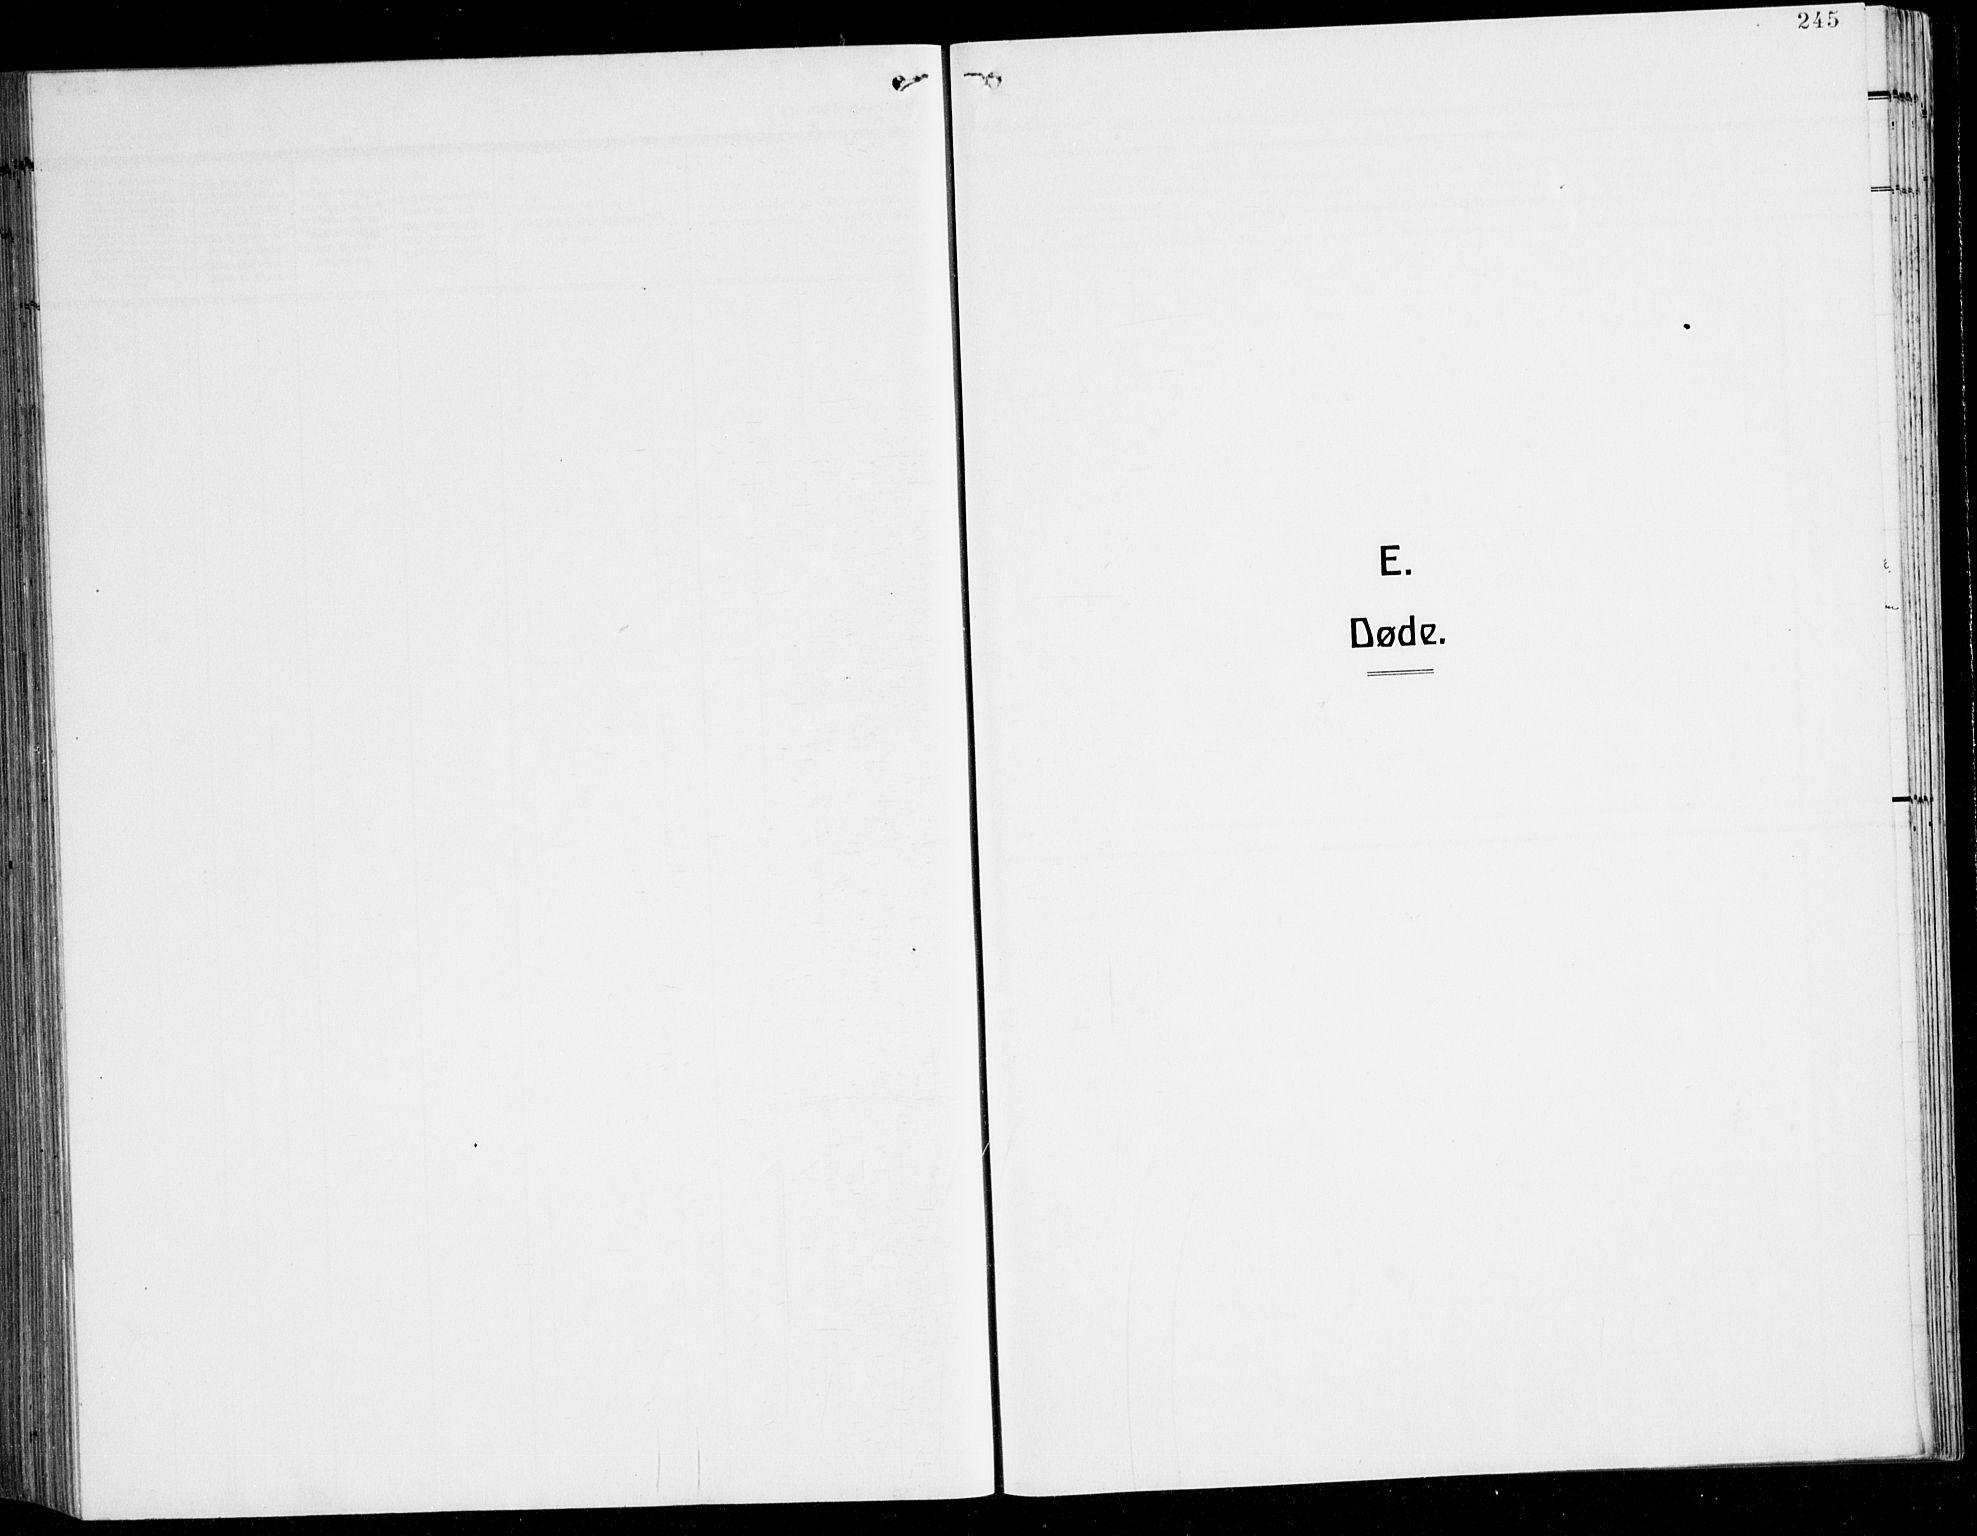 SAB, Herdla Sokneprestembete, H/Hab: Klokkerbok nr. C 3, 1926-1940, s. 245